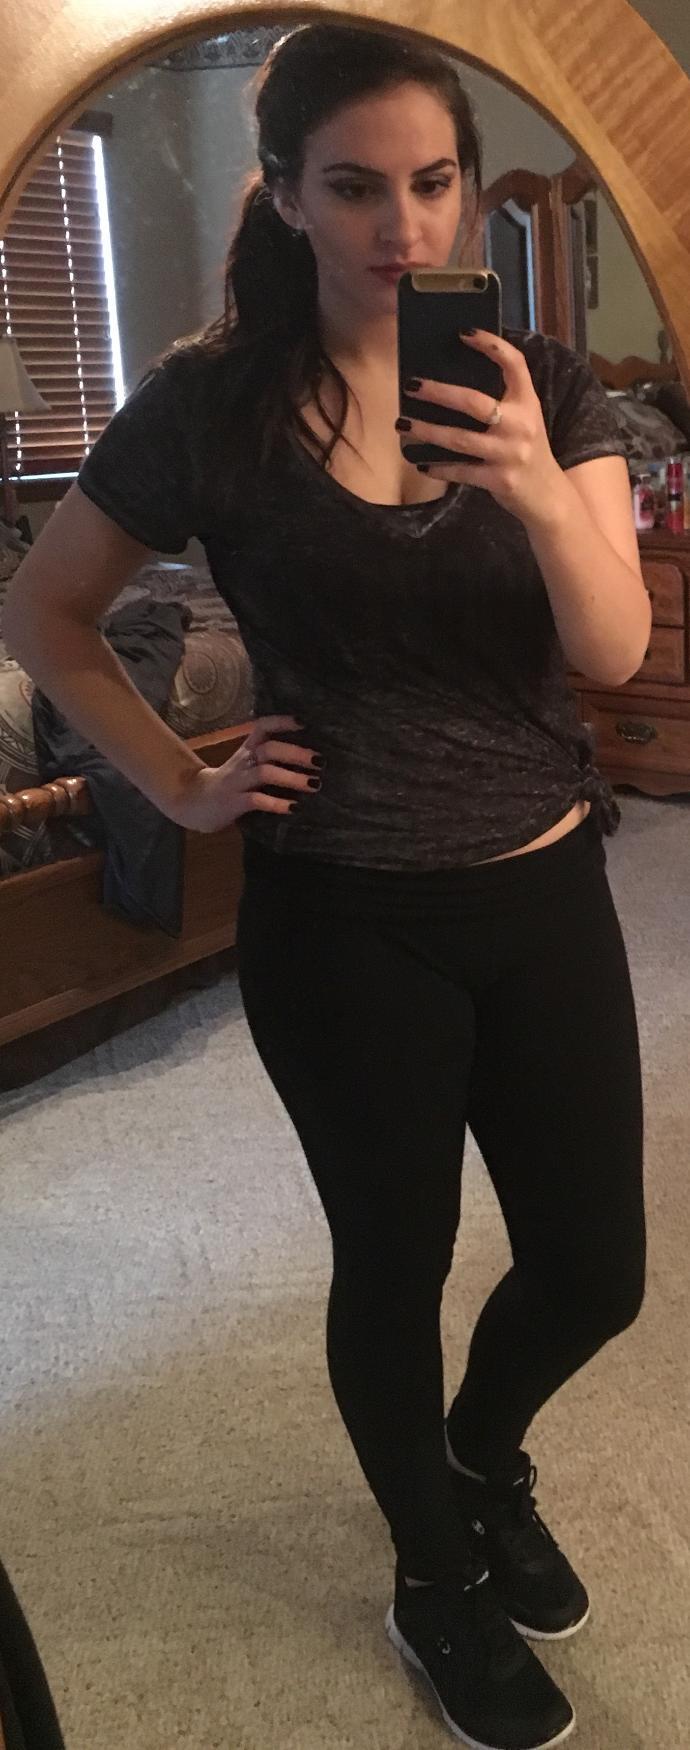 Overweight, curvy, chubby...?